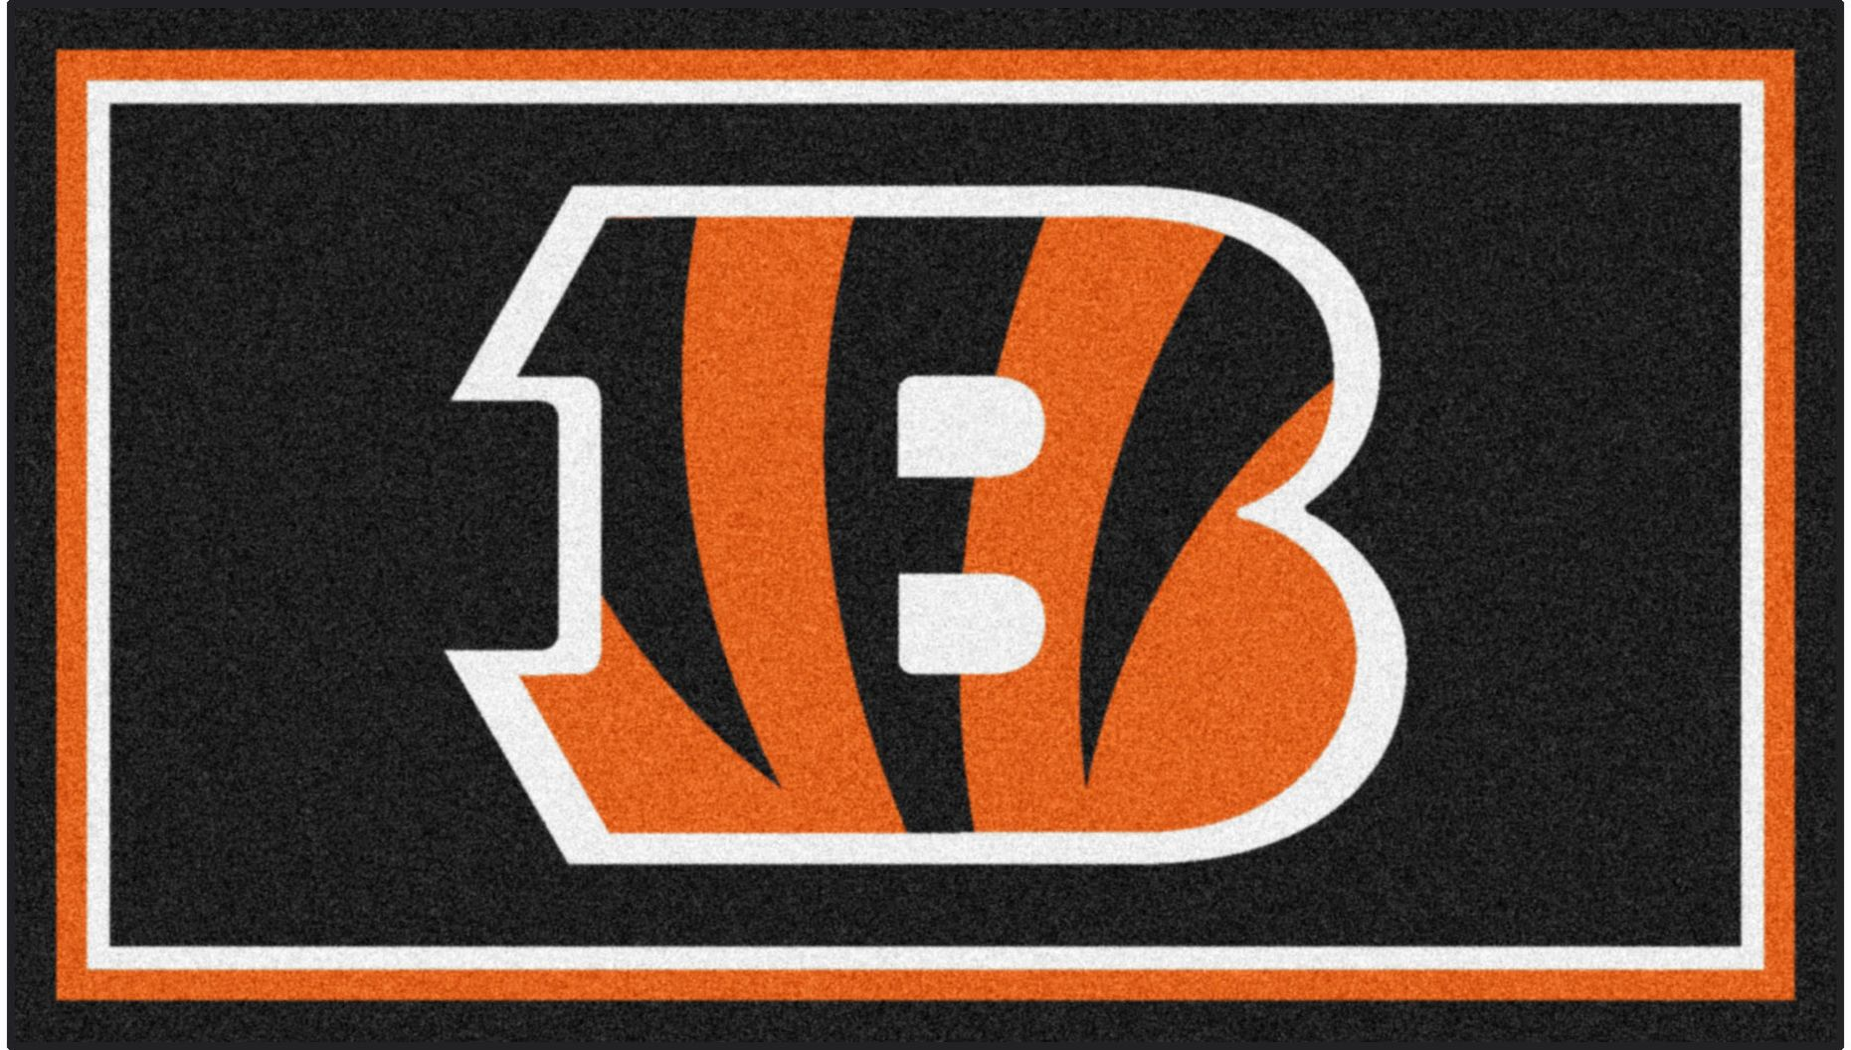 NFL Big Game Cincinnati Bengals 3' x 5' Rug